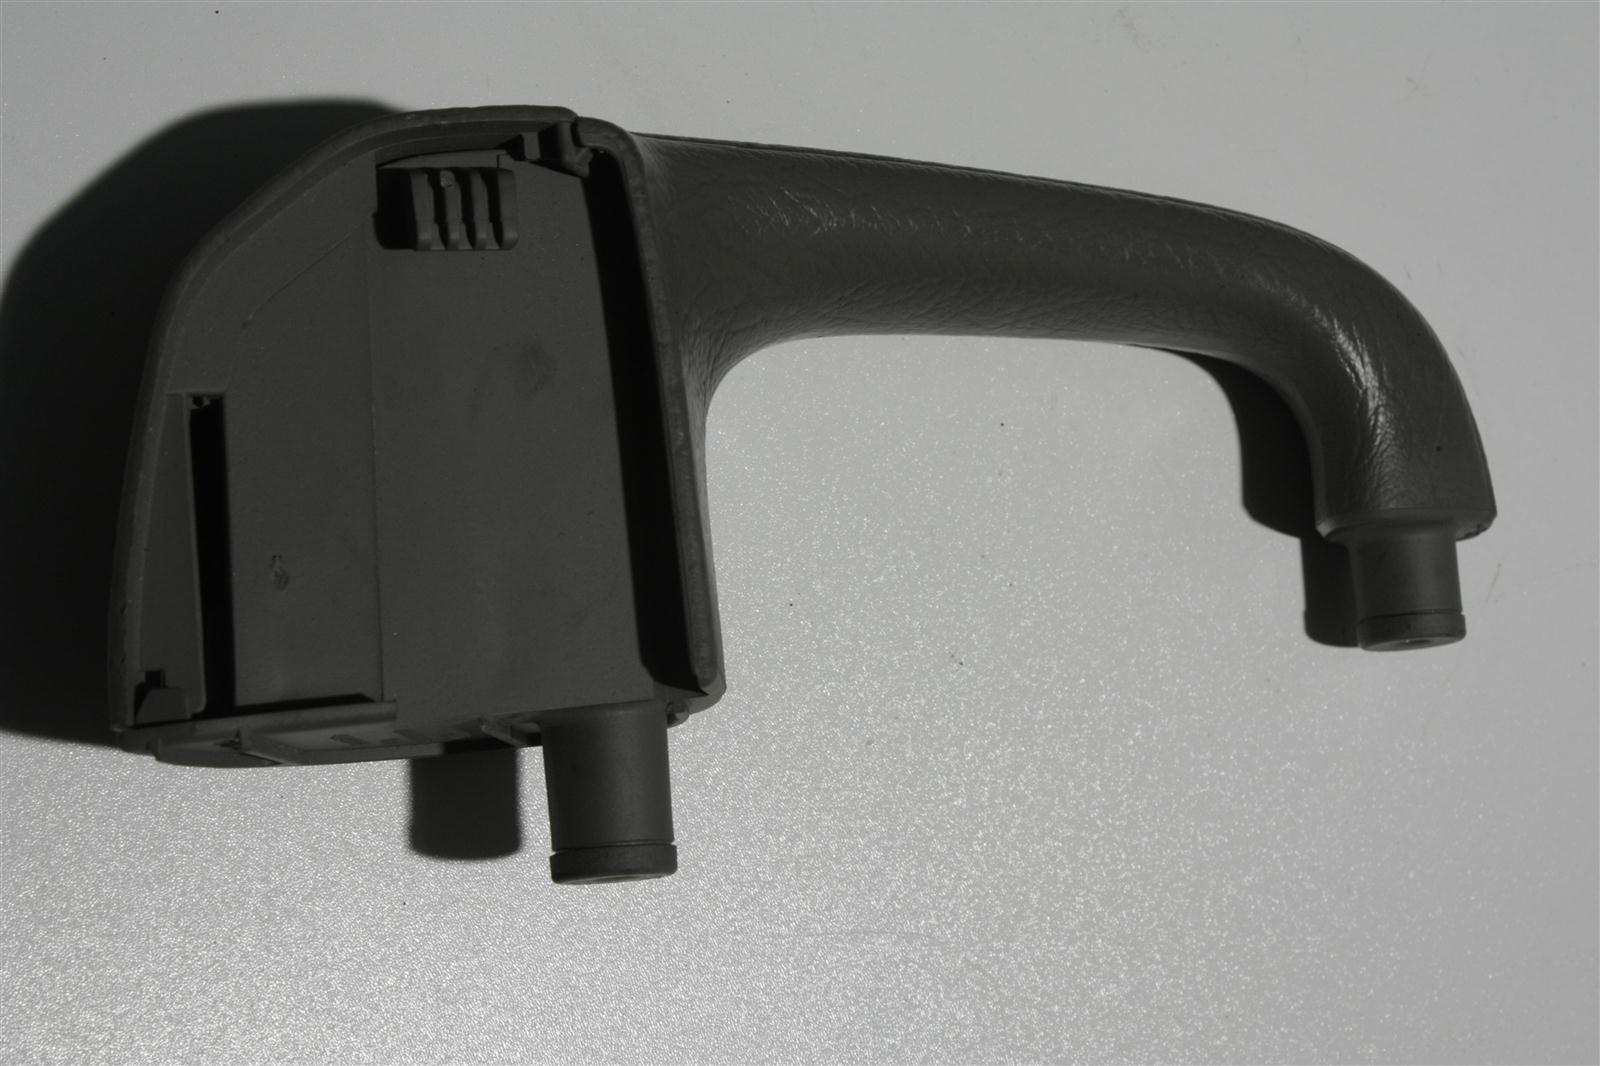 Audi 100/A6 C4 Haltegriff Vorne Rechts platin 4A0867172